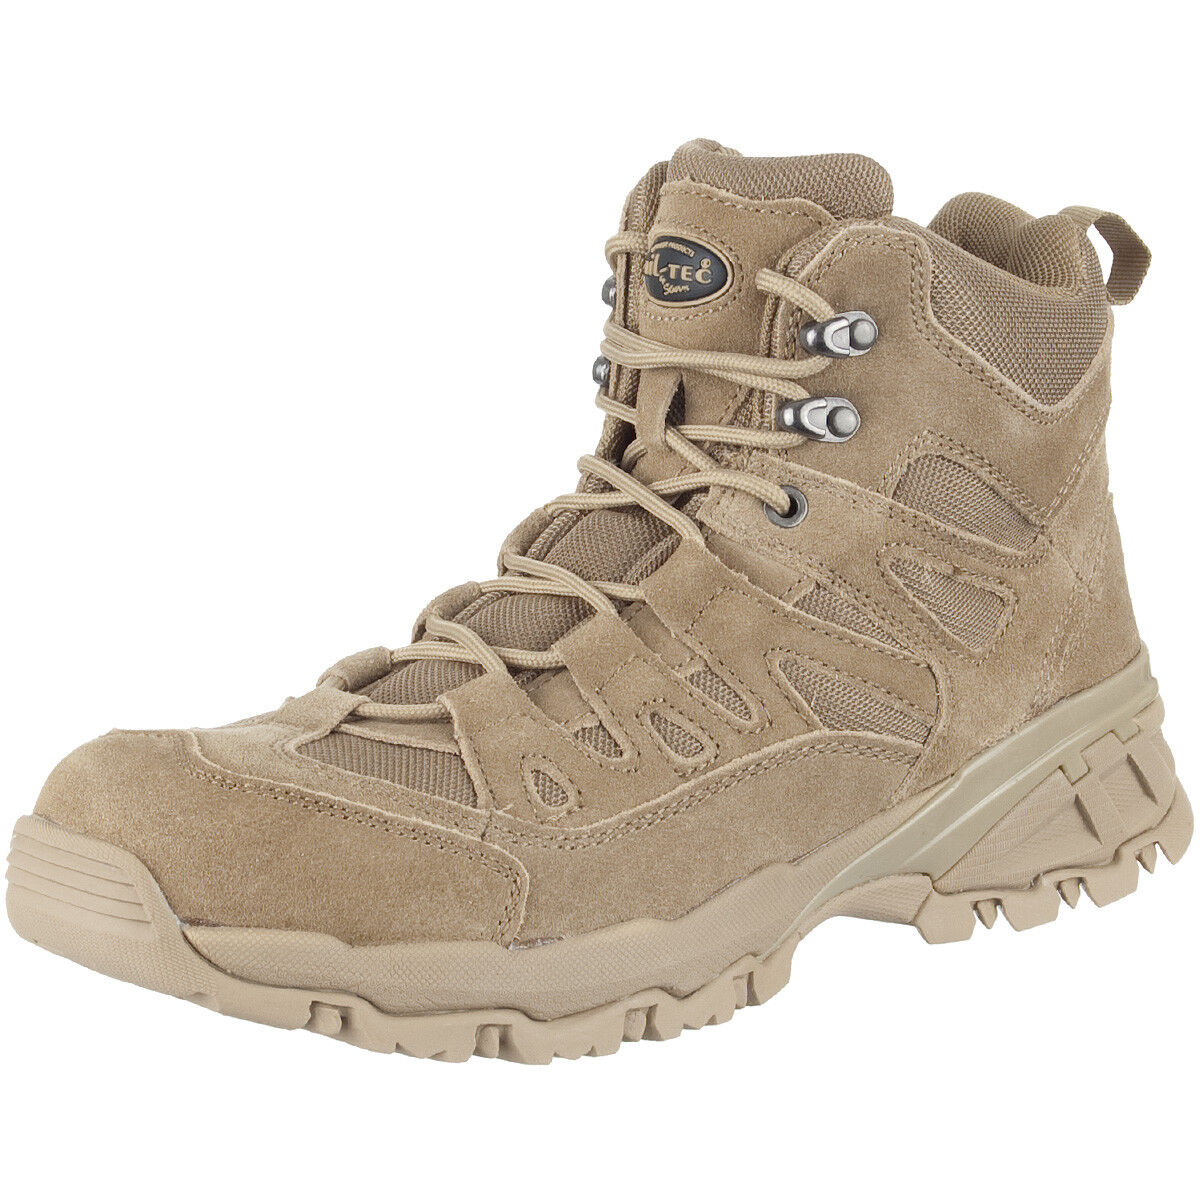 Mil-Tec Tactical Mens Combat Squad Boots Military Army Patrol Footwear Coyote